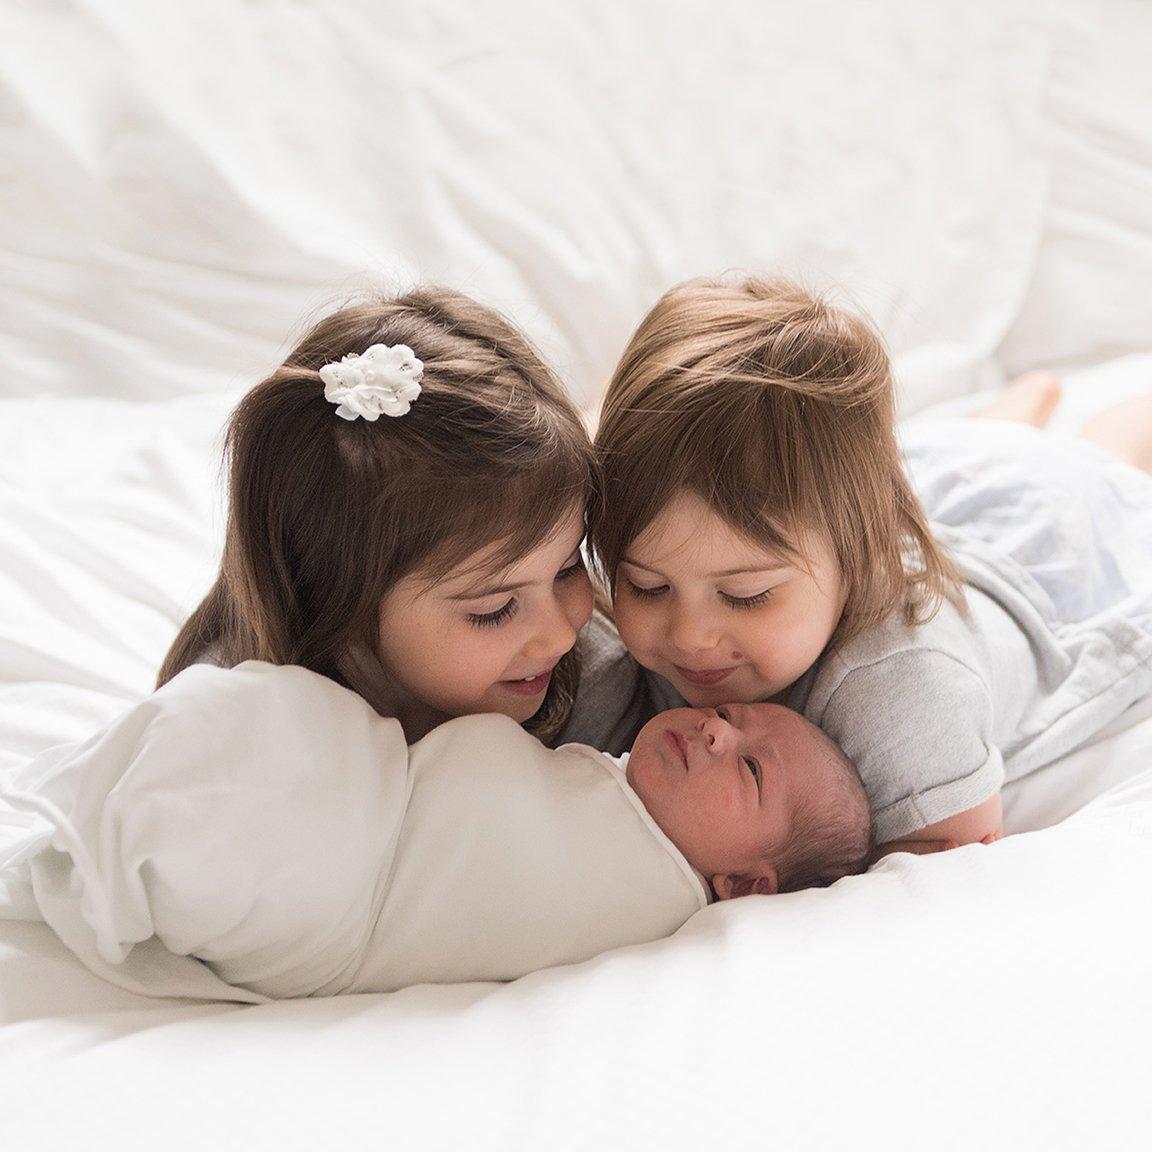 Newborn photo session with siblings newborn photography boston